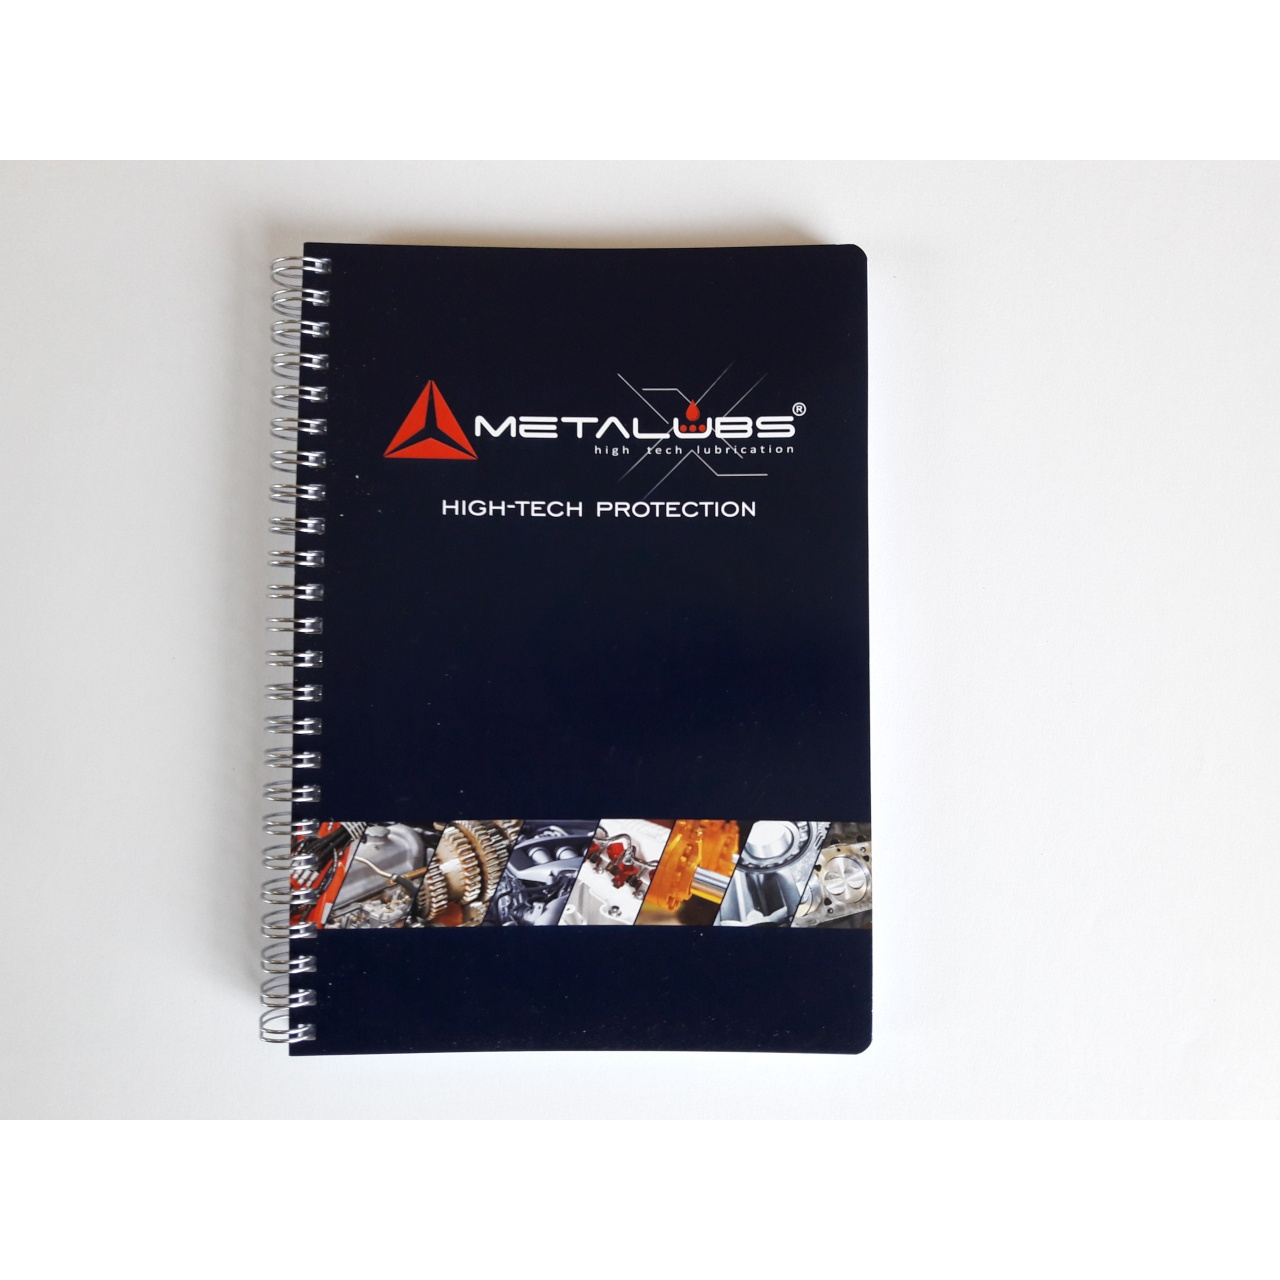 Metalubs notebook